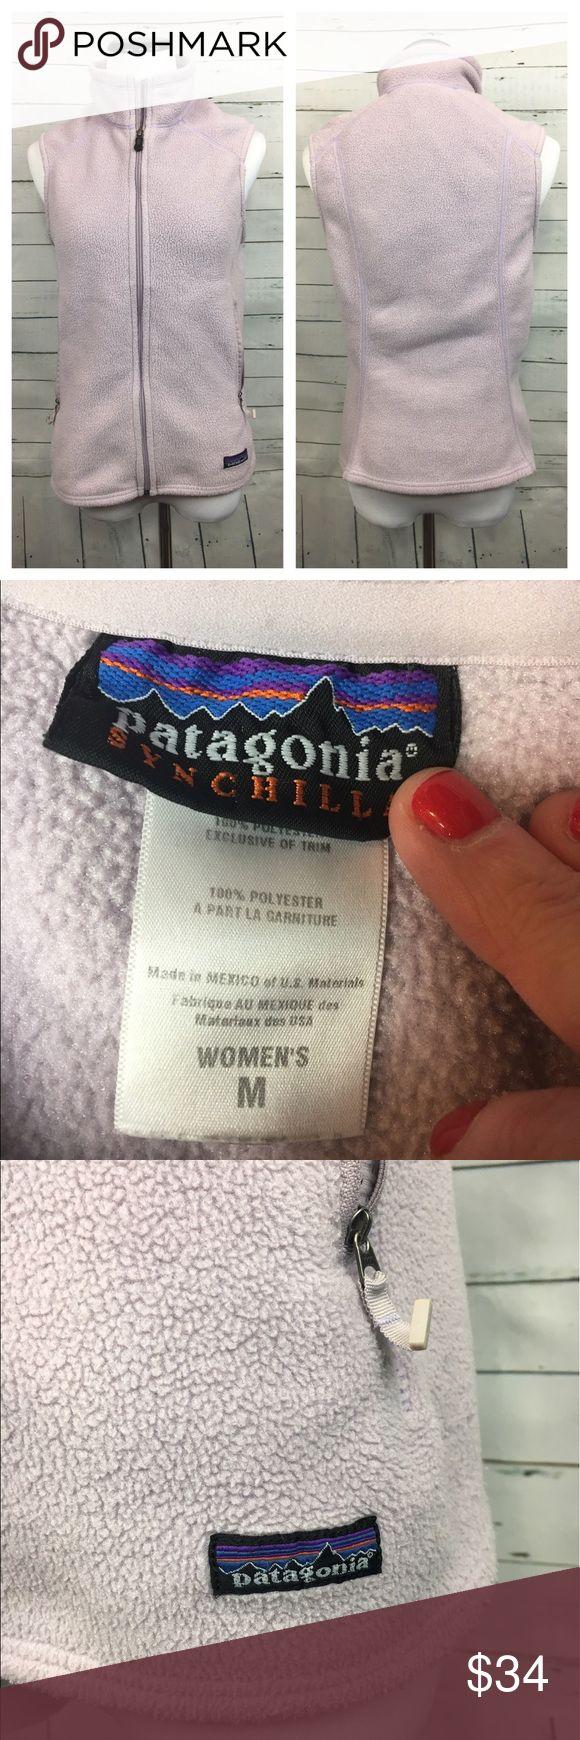 "Patagonia synchilla lilac purple fleece vest Women's Patagonia synchilla purple lavender zip front fleece vest. size m  armpit to armpit-18"" overall length-25"" Patagonia Jackets & Coats Vests"